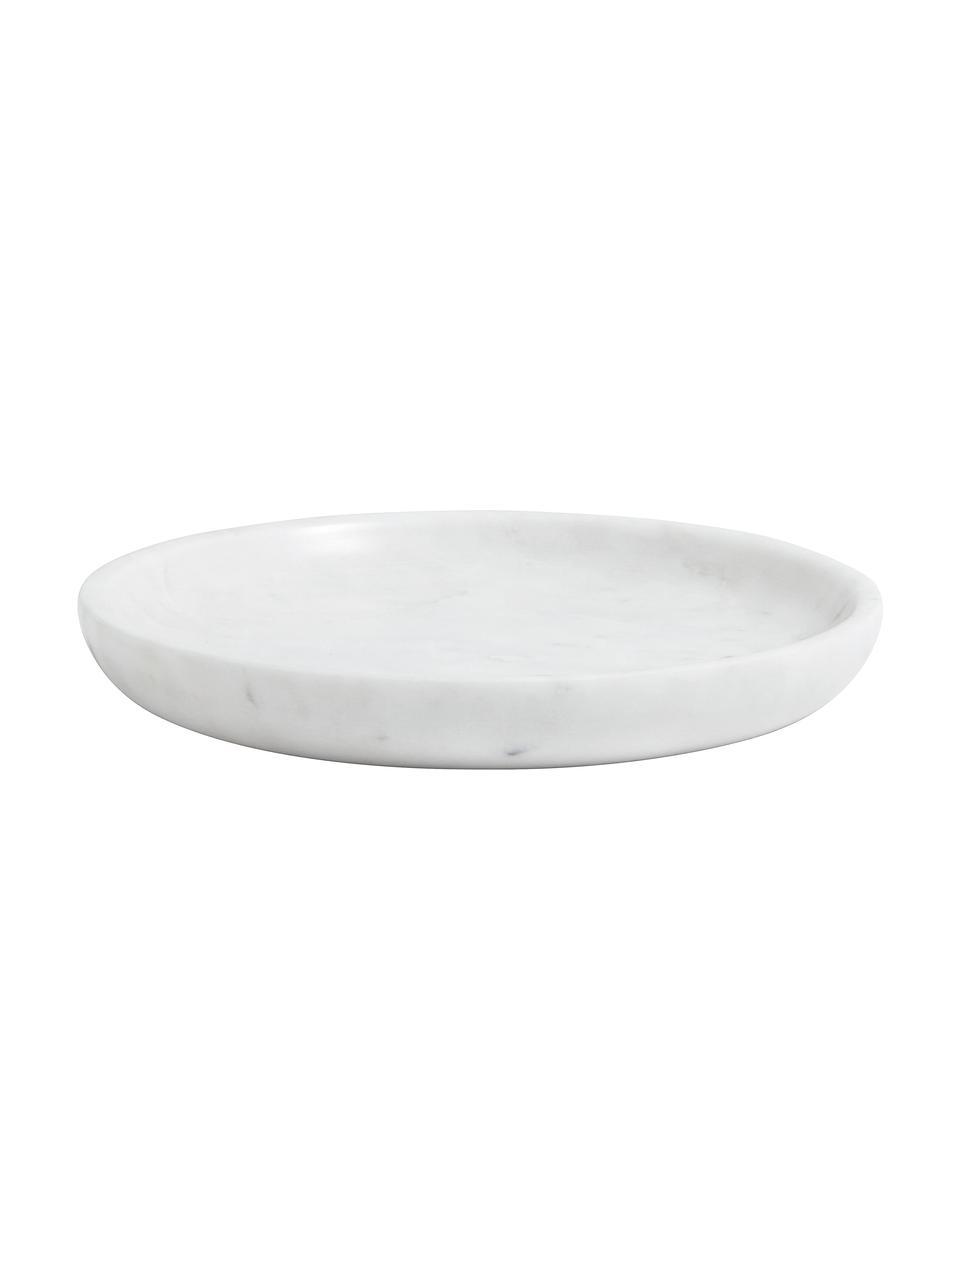 Marmor-Deko-Tablett Lorka, Marmor, Weiß, Ø 17 x H 2 cm